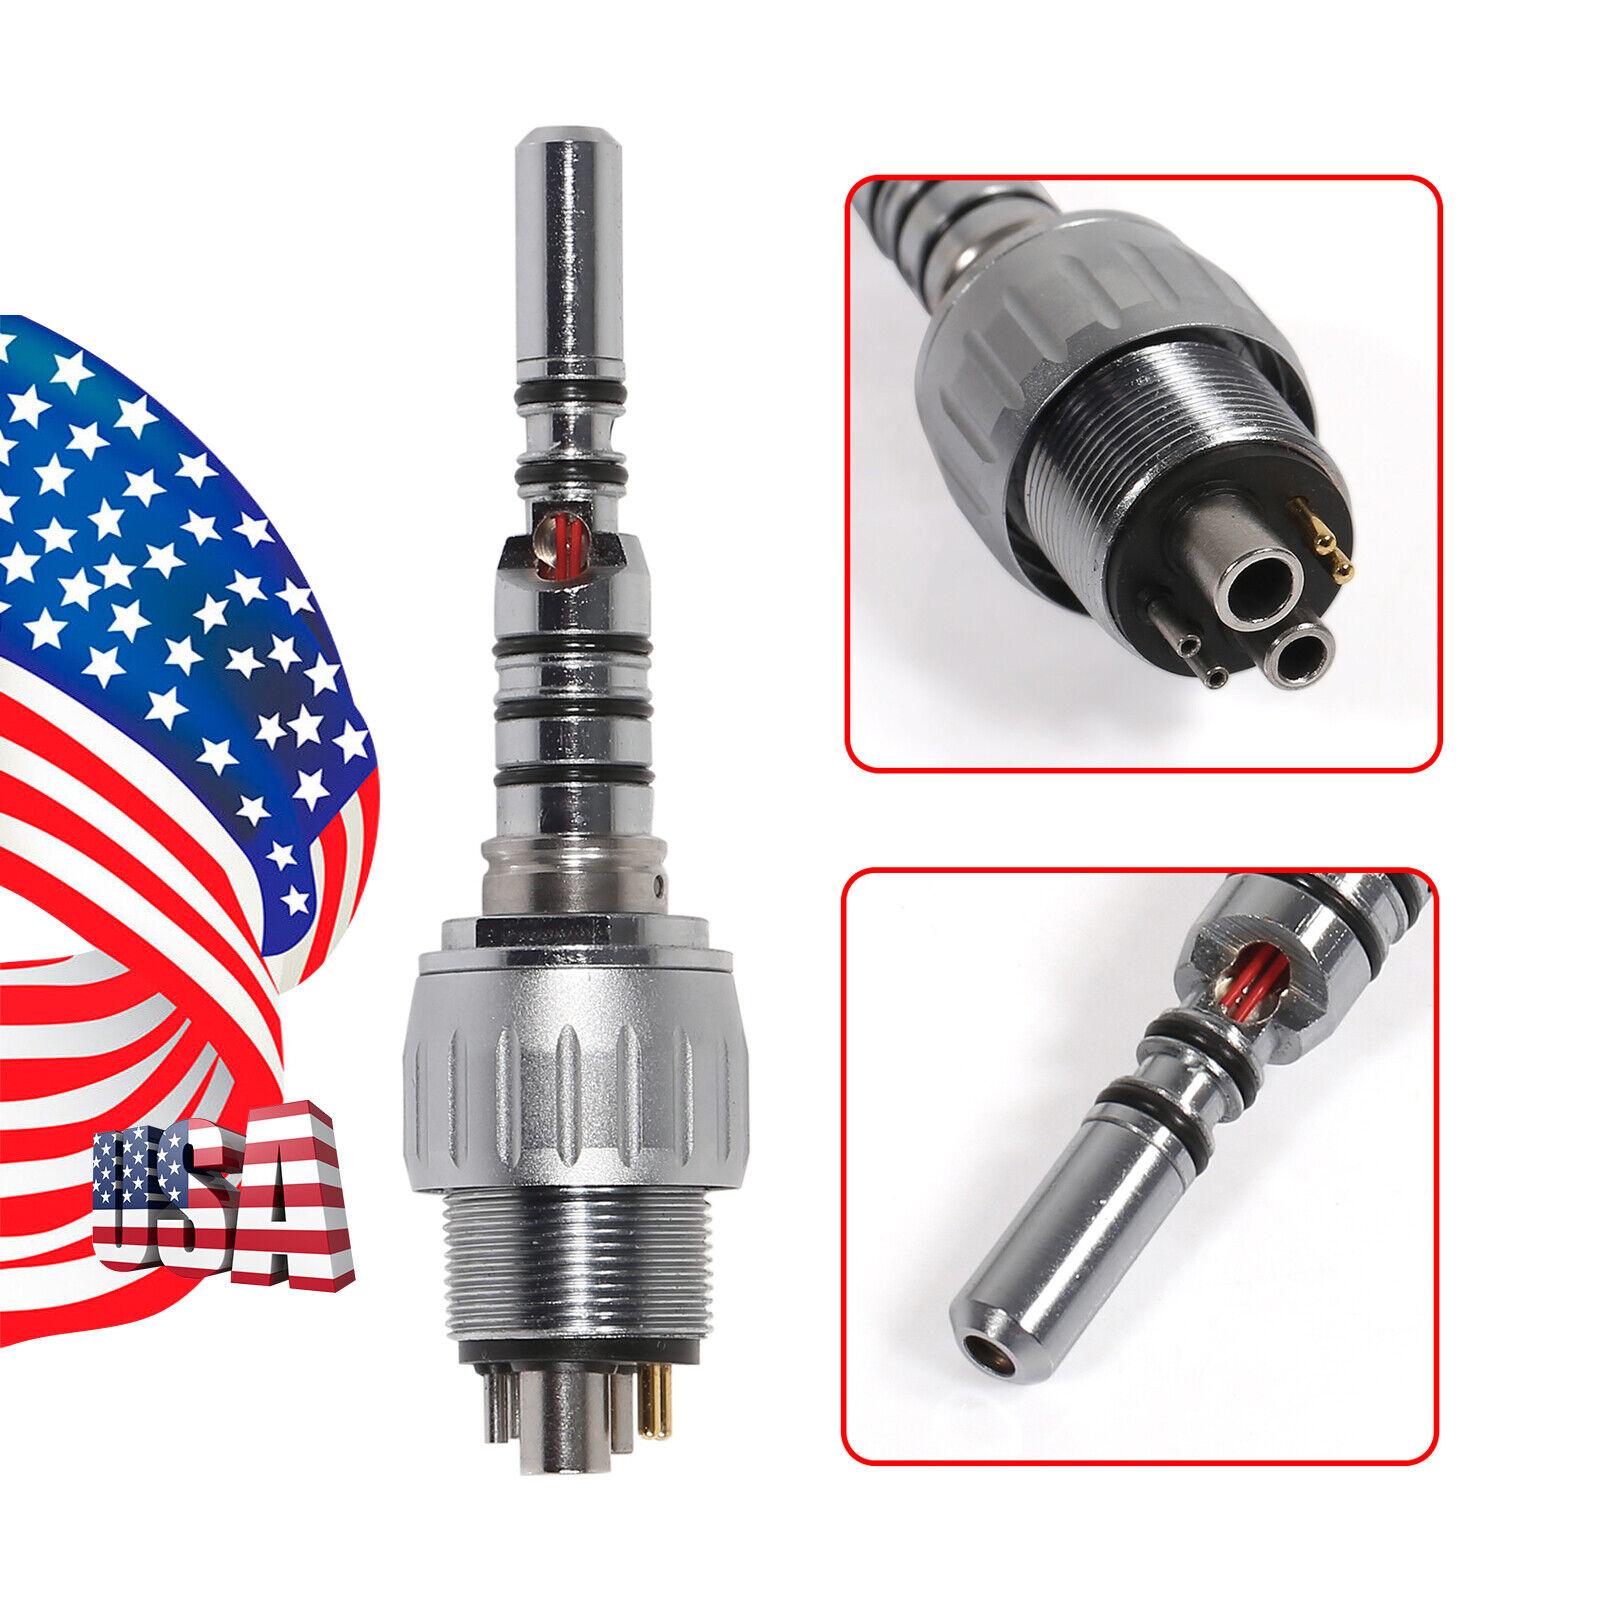 3pc USA Dental Quick Coupler Coupling Swivel 6-hole 6 Pin Fit Multiflex LUX - $103.20